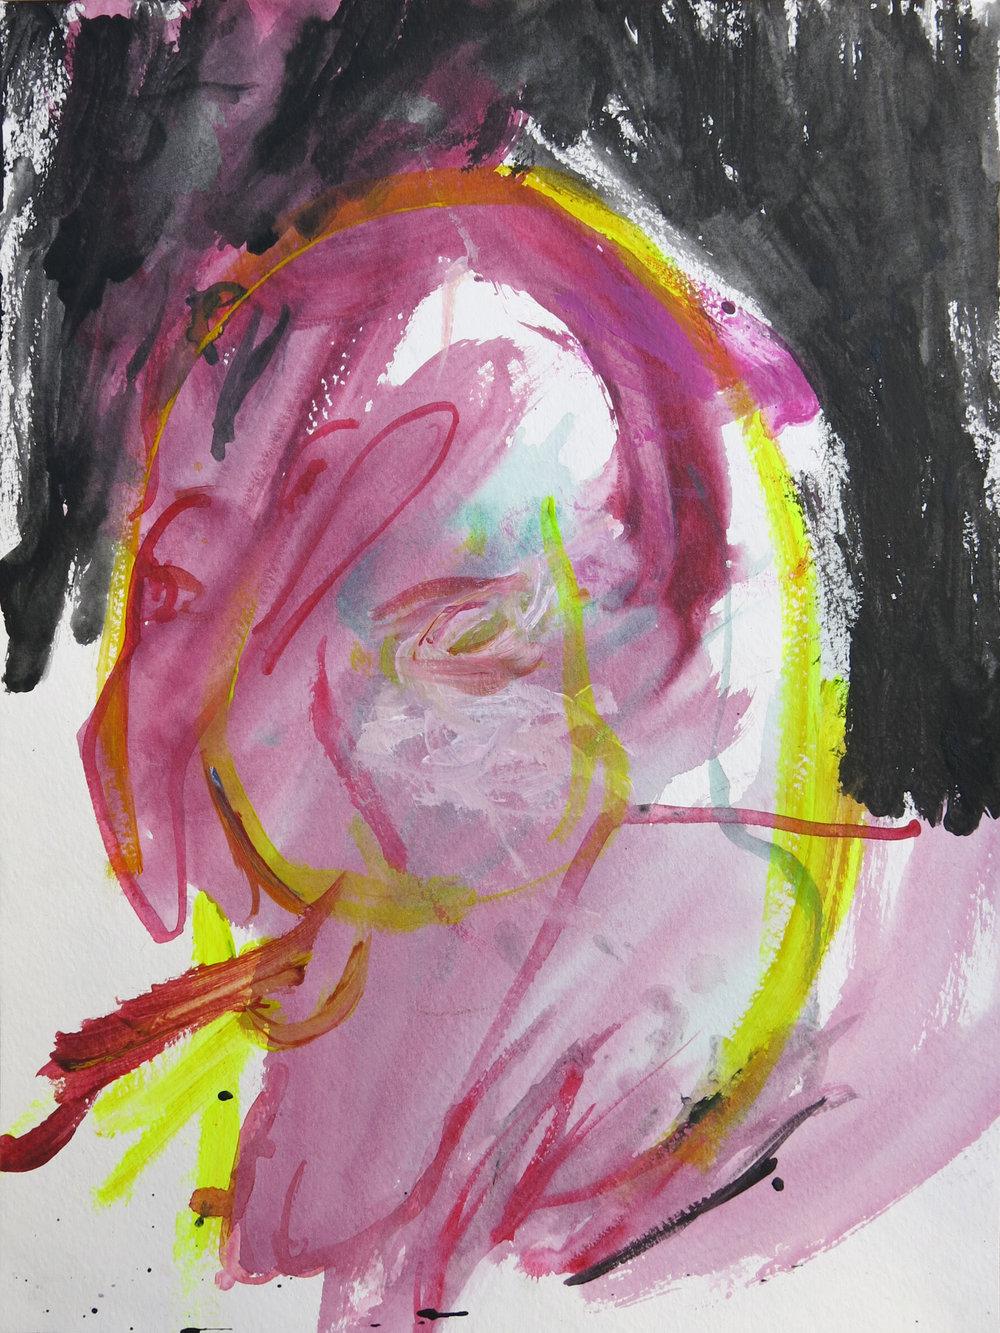 Barbra Streisand Portrait #103